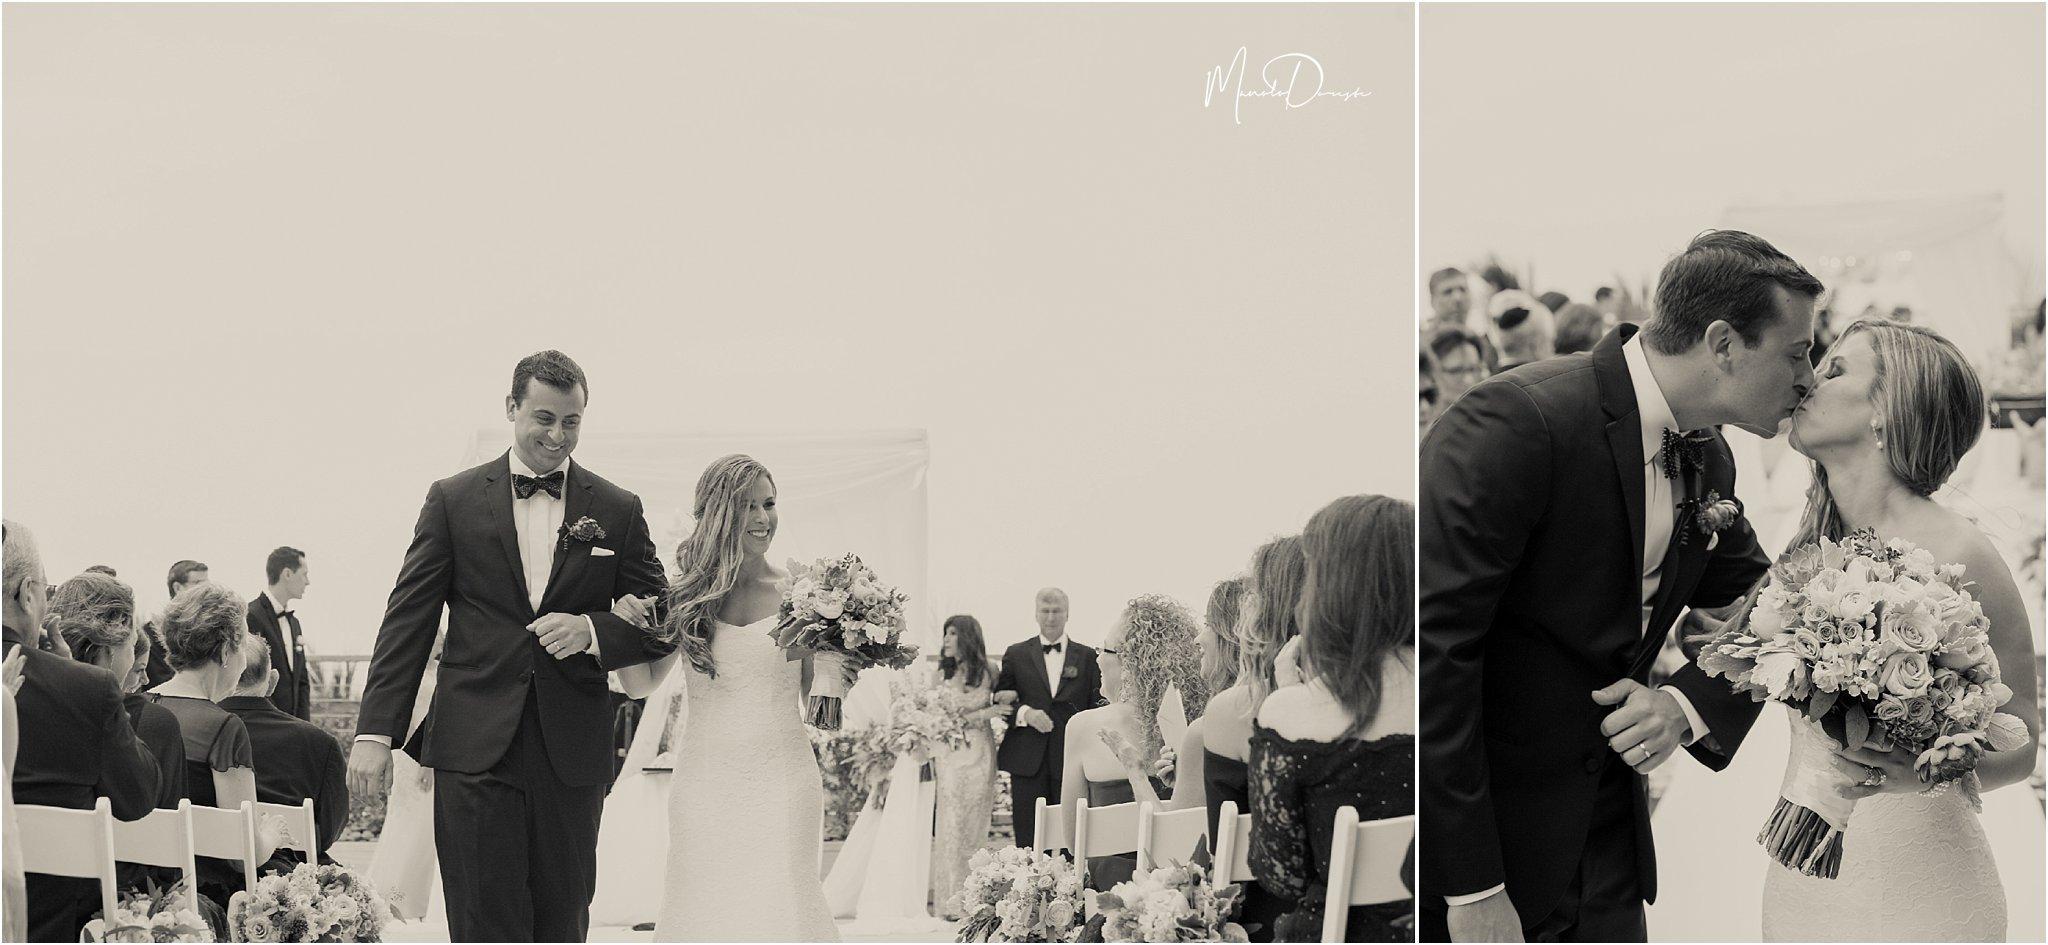 0672_ManoloDoreste_InFocusStudios_Wedding_Family_Photography_Miami_MiamiPhotographer.jpg